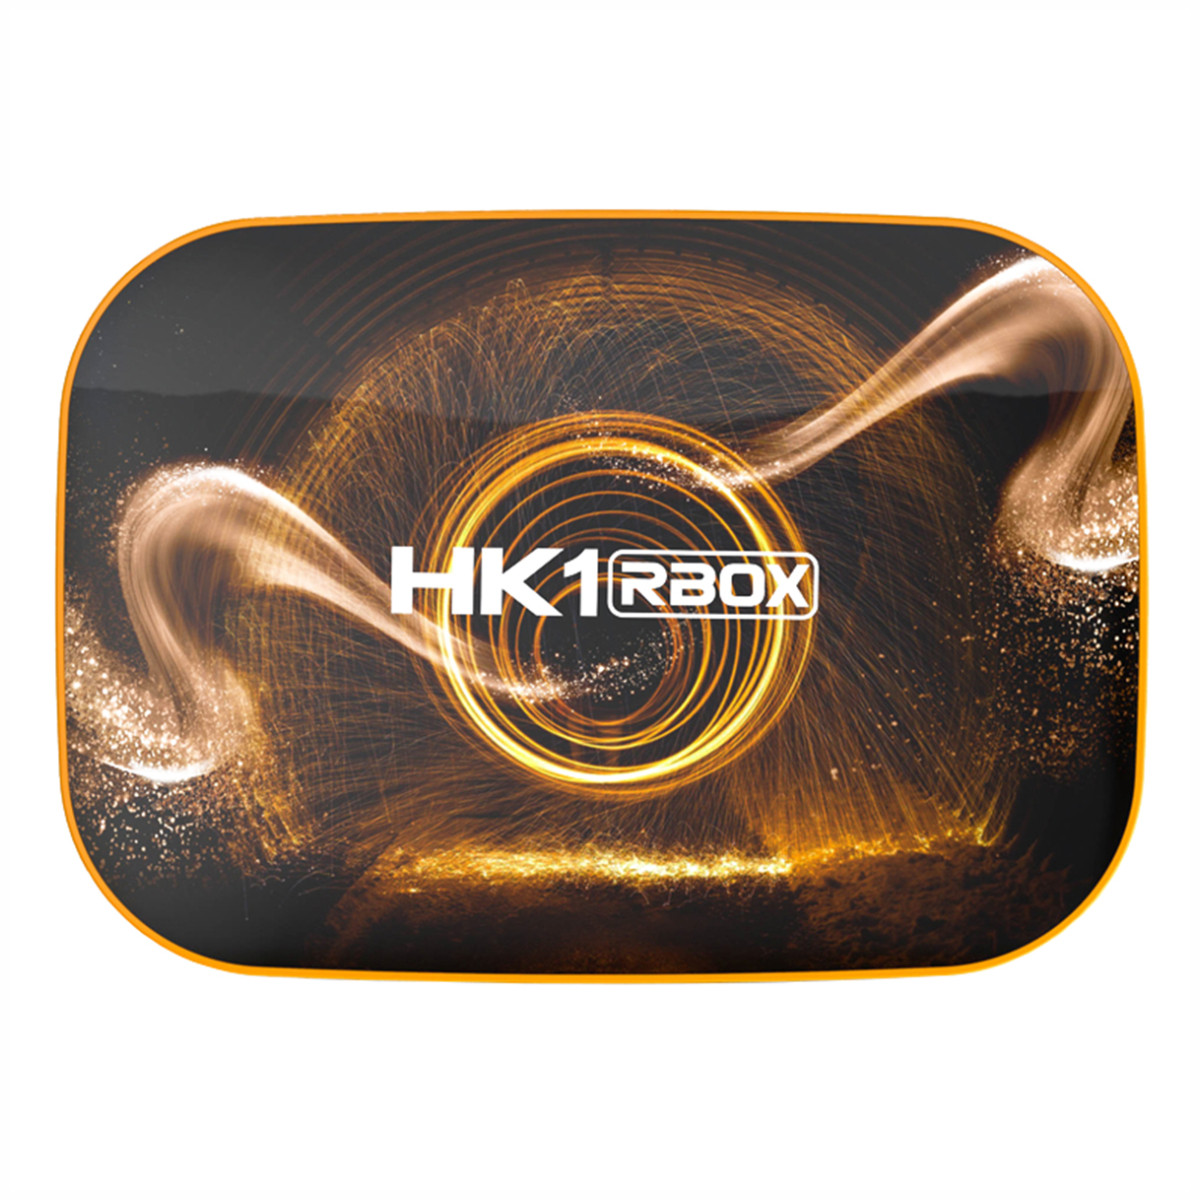 Android Smart TV приставка SKY (HK1 RBOX) 4/32 GB